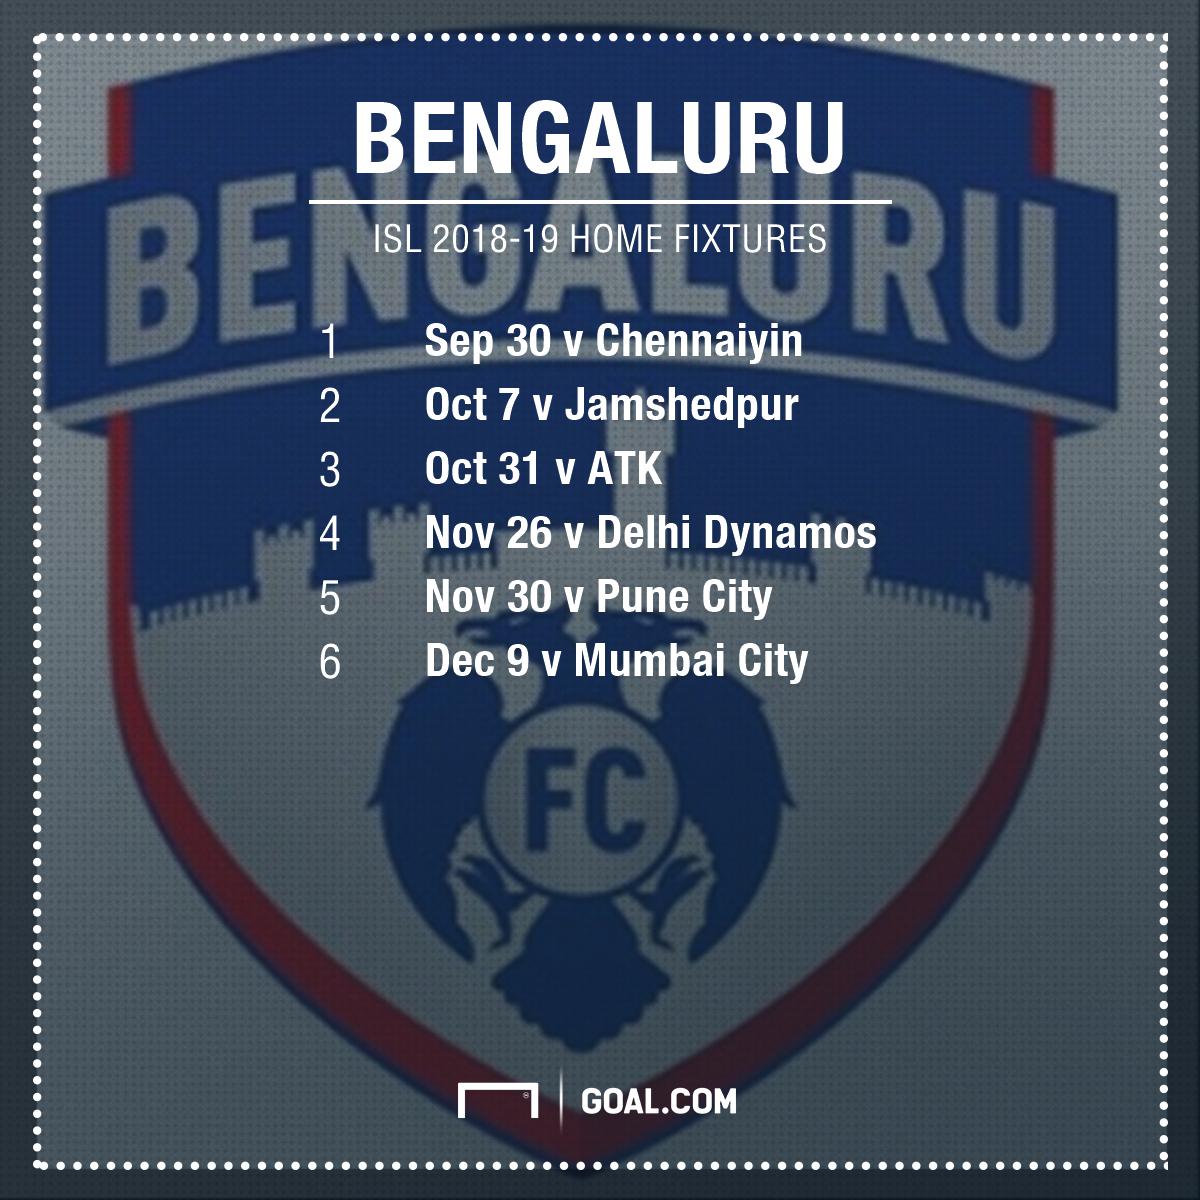 Bengaluru FC home fixtures